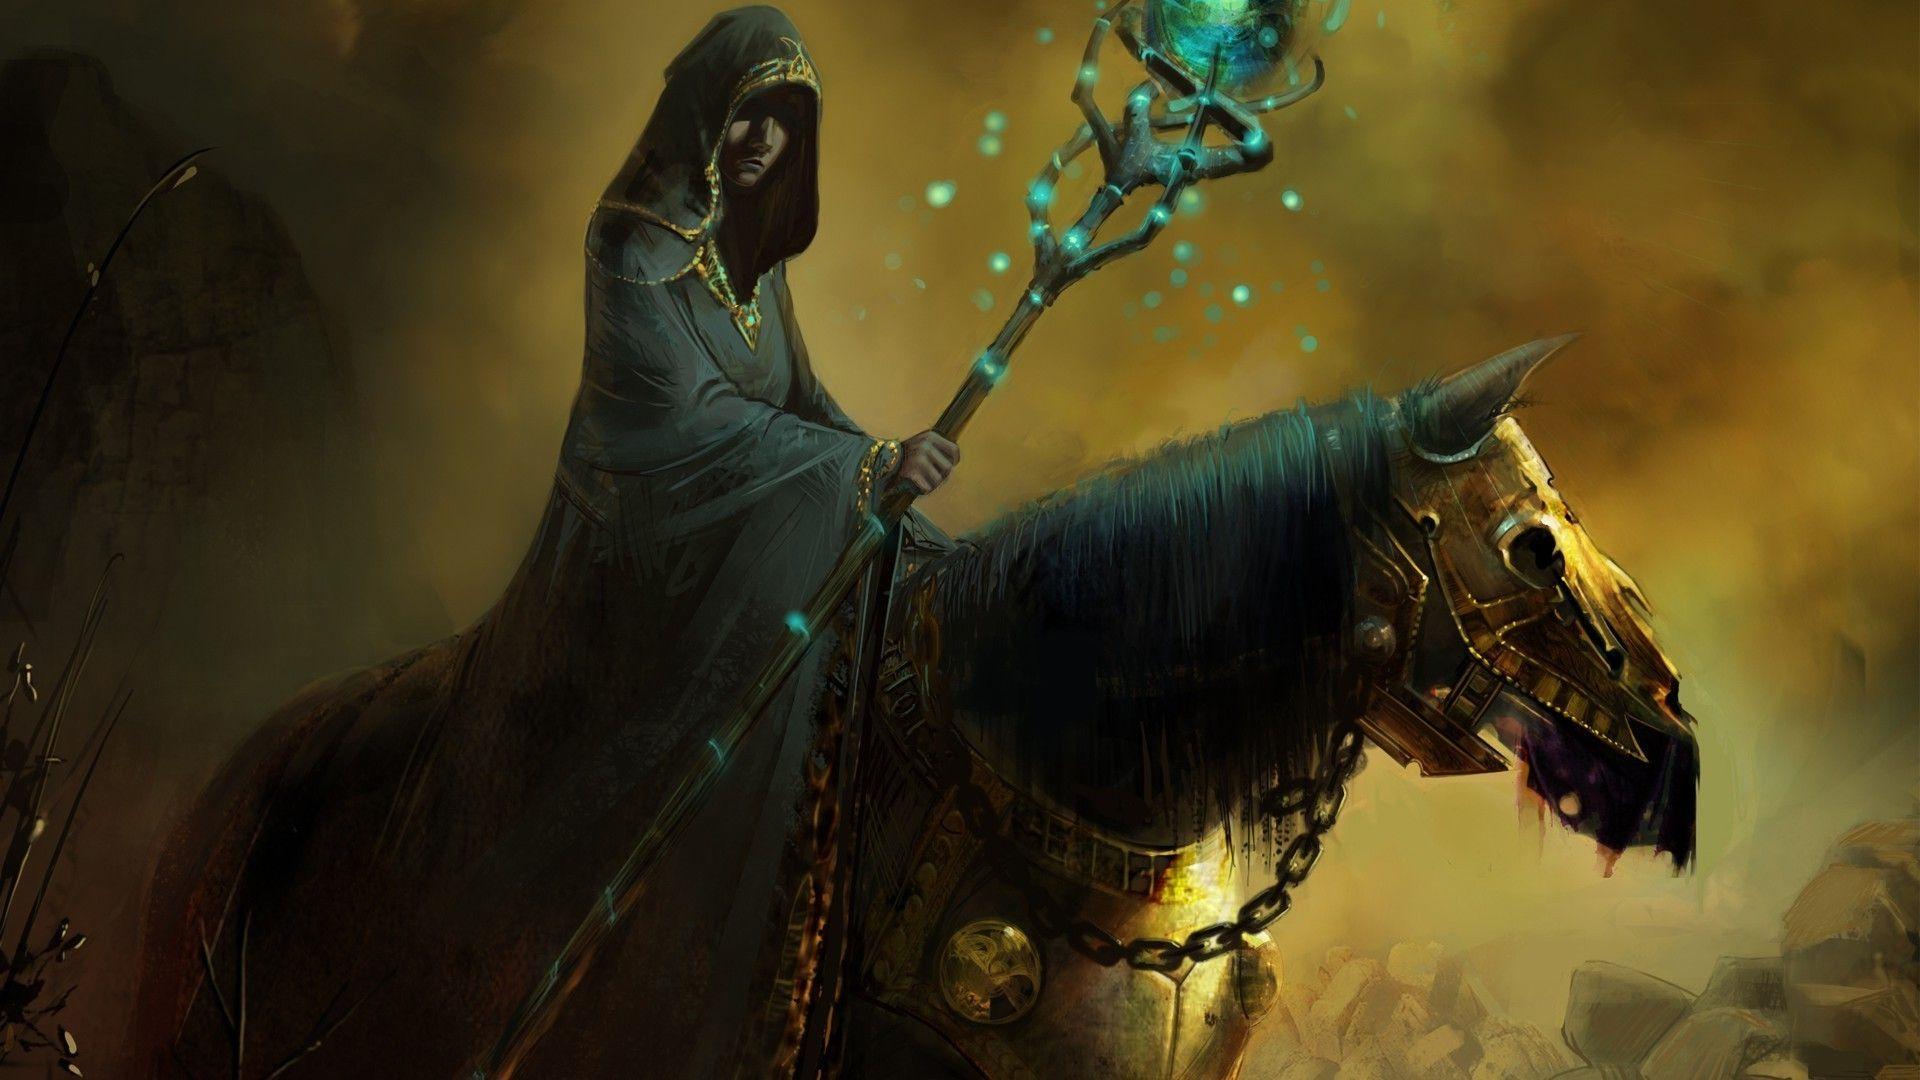 Wizard HD Wallpaper